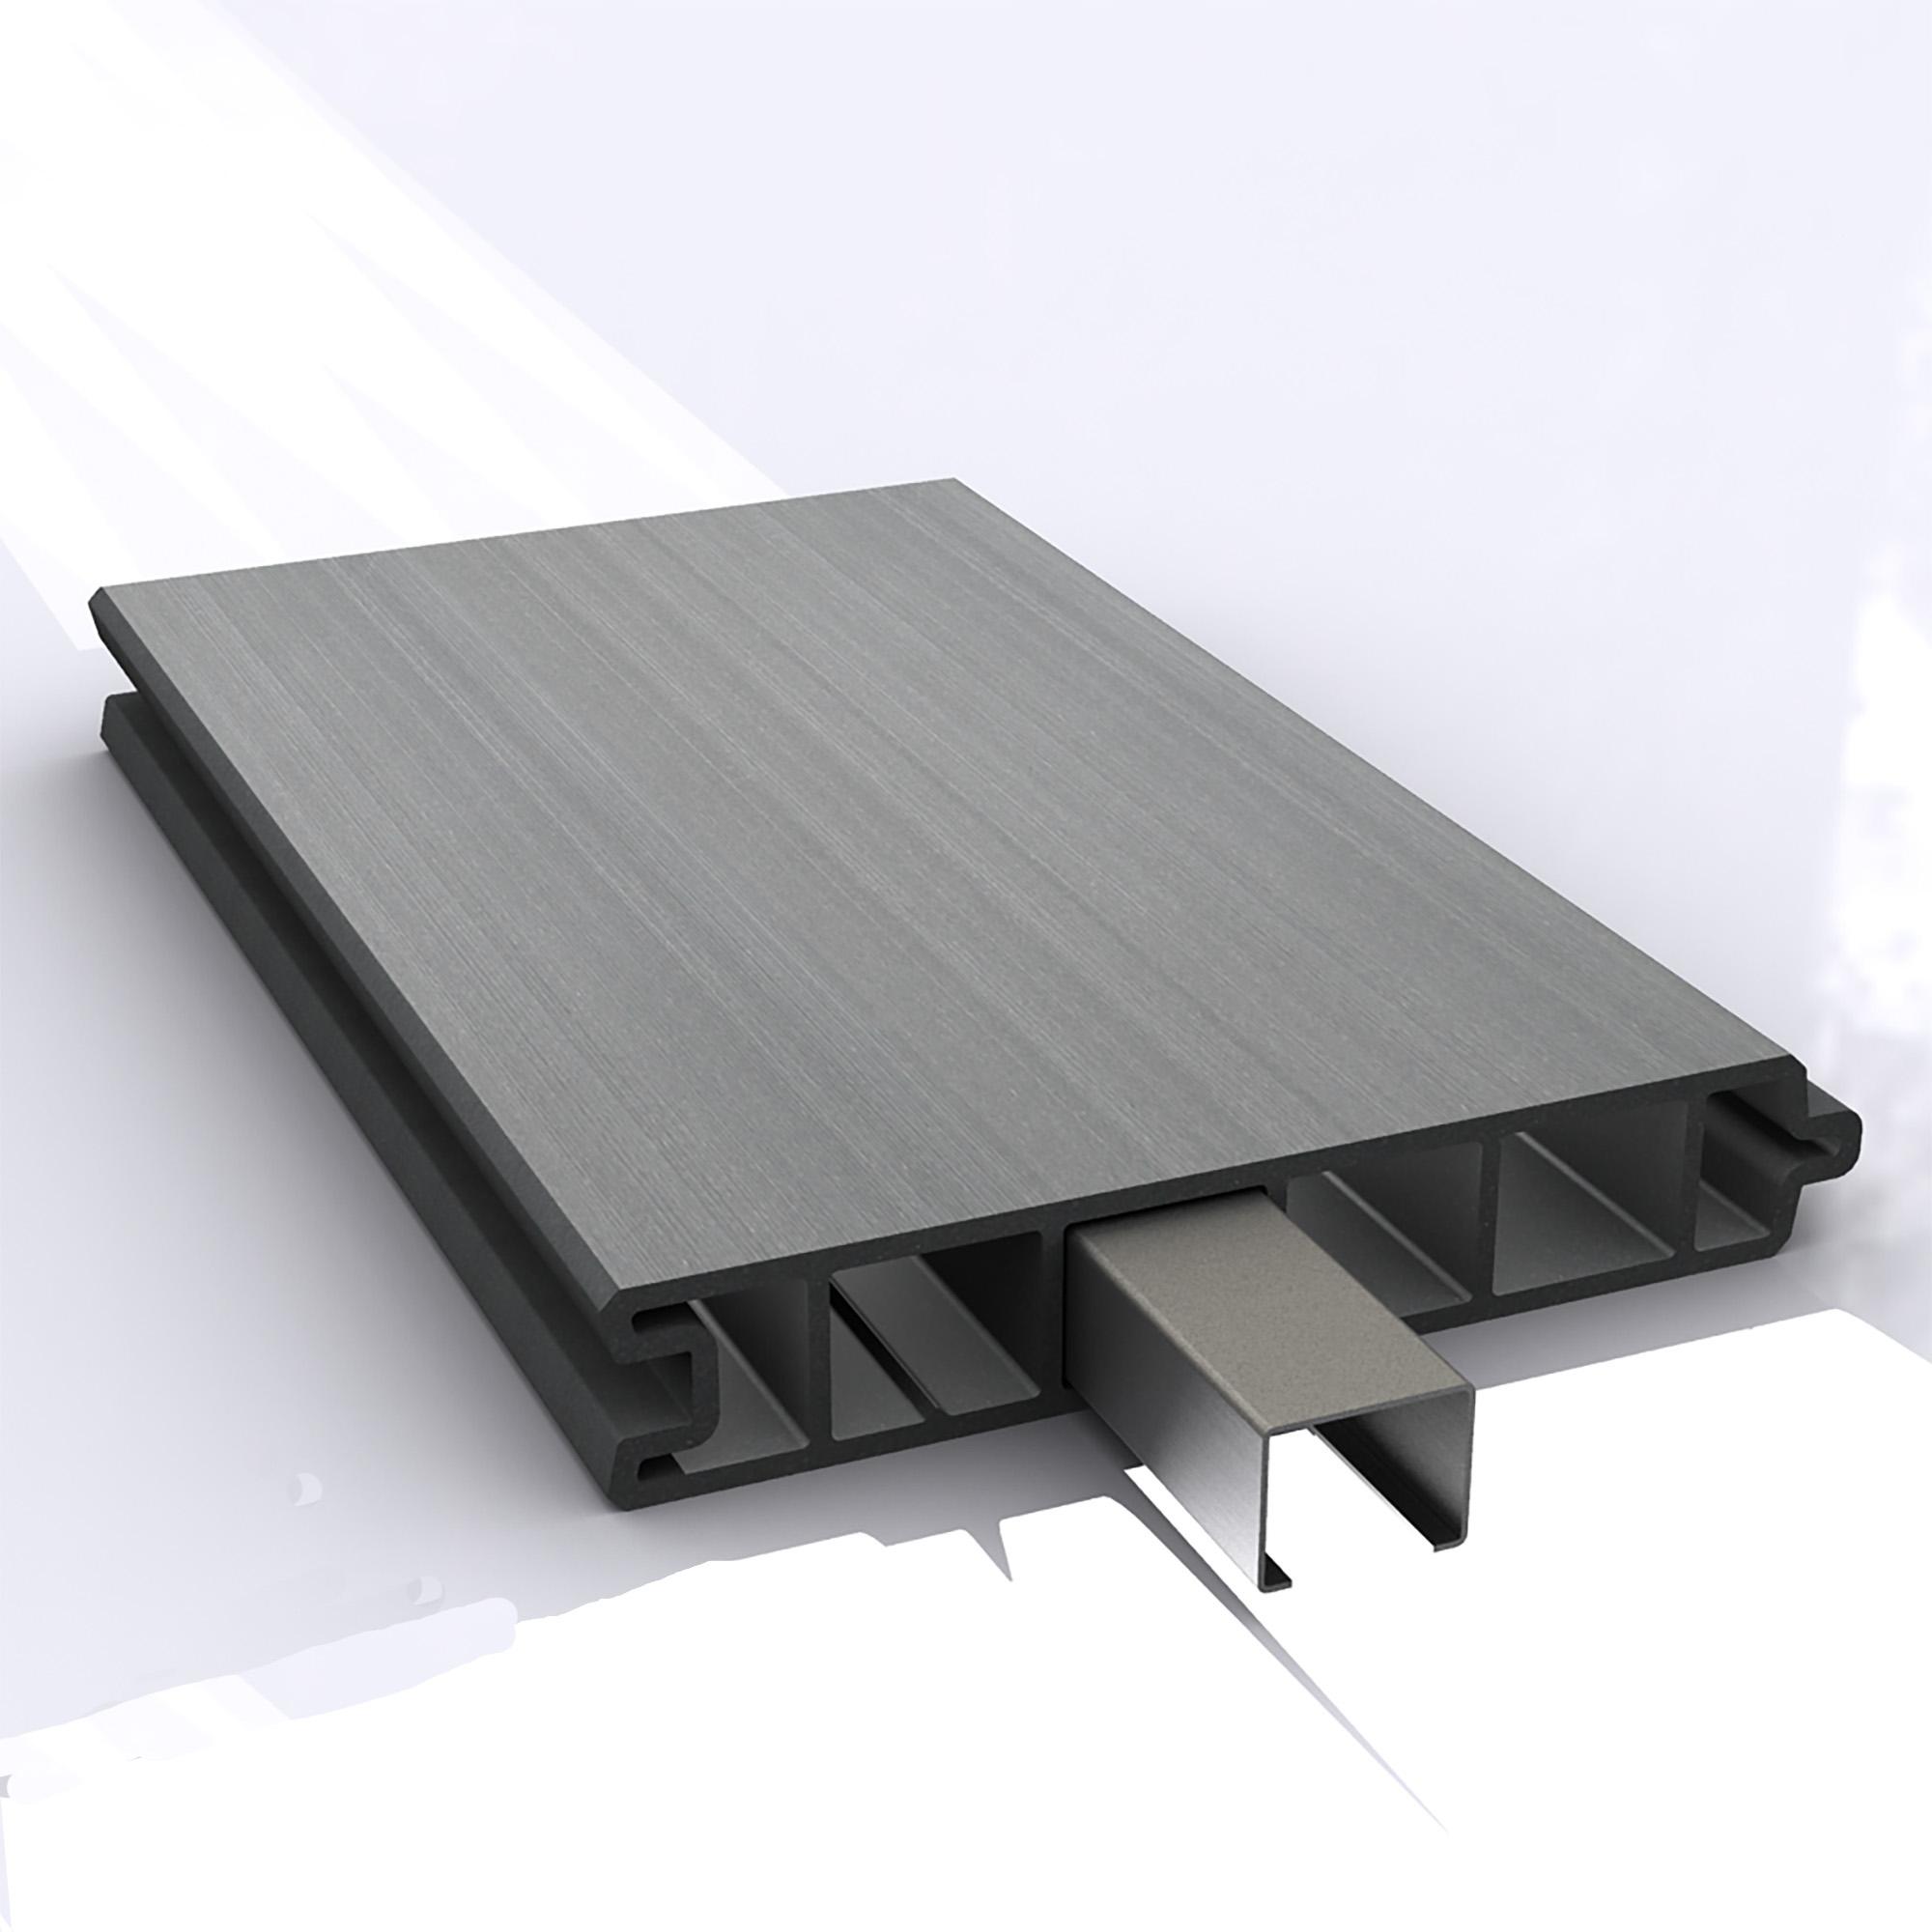 Duofuse | Tand- en groefplank | 180cm | Tropical Brown